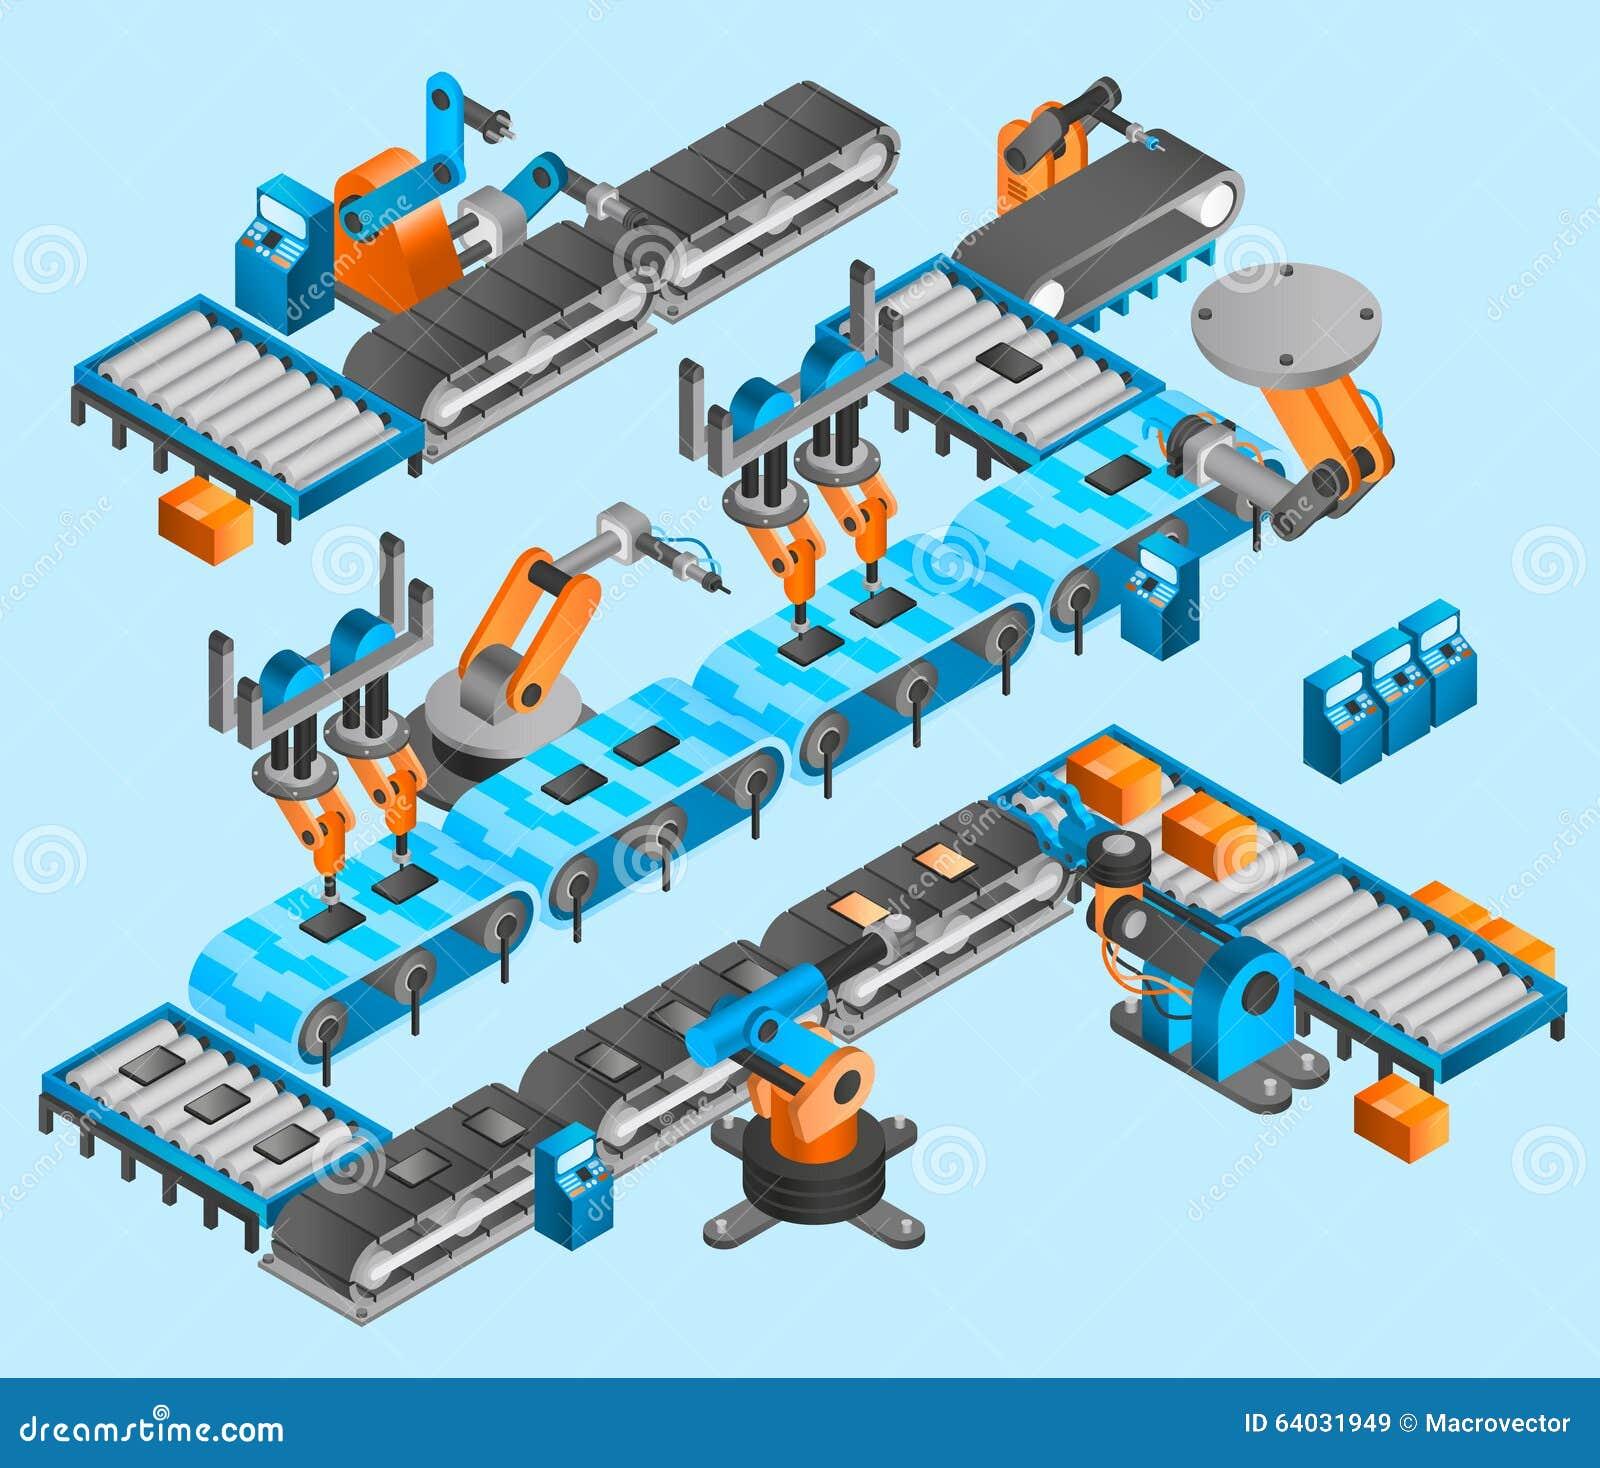 Industrial Robot Isometric Concept Stock Vector